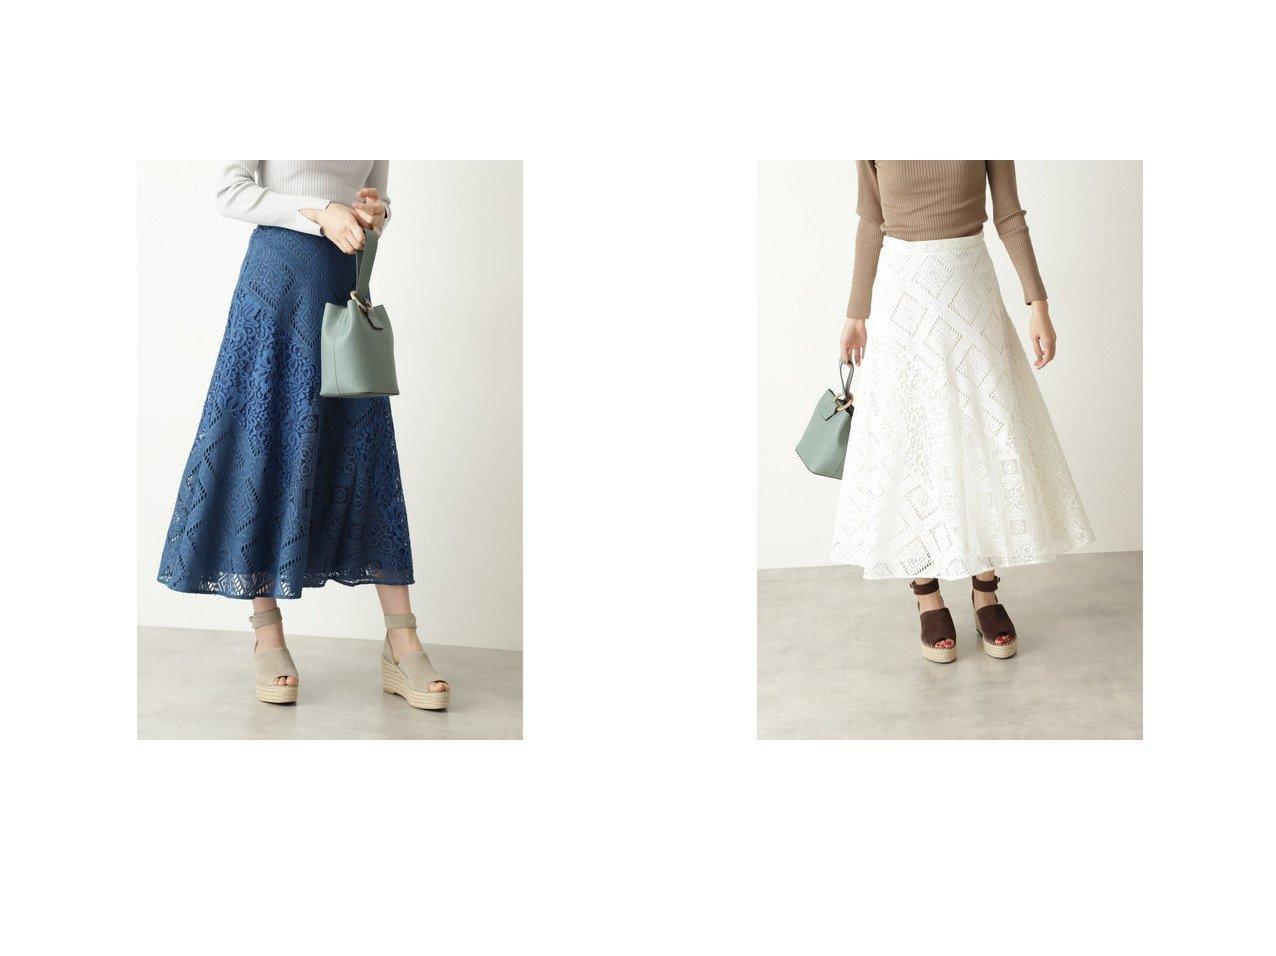 【JILLSTUART/ジルスチュアート】のレースブロッキングスカート 【スカート】おすすめ!人気、トレンド・レディースファッションの通販 おすすめで人気の流行・トレンド、ファッションの通販商品 メンズファッション・キッズファッション・インテリア・家具・レディースファッション・服の通販 founy(ファニー) https://founy.com/ ファッション Fashion レディースファッション WOMEN スカート Skirt 2021年 2021 2021春夏・S/S SS/Spring/Summer/2021 S/S・春夏 SS・Spring/Summer スリム パッチワーク レース ロング 春 Spring |ID:crp329100000031431